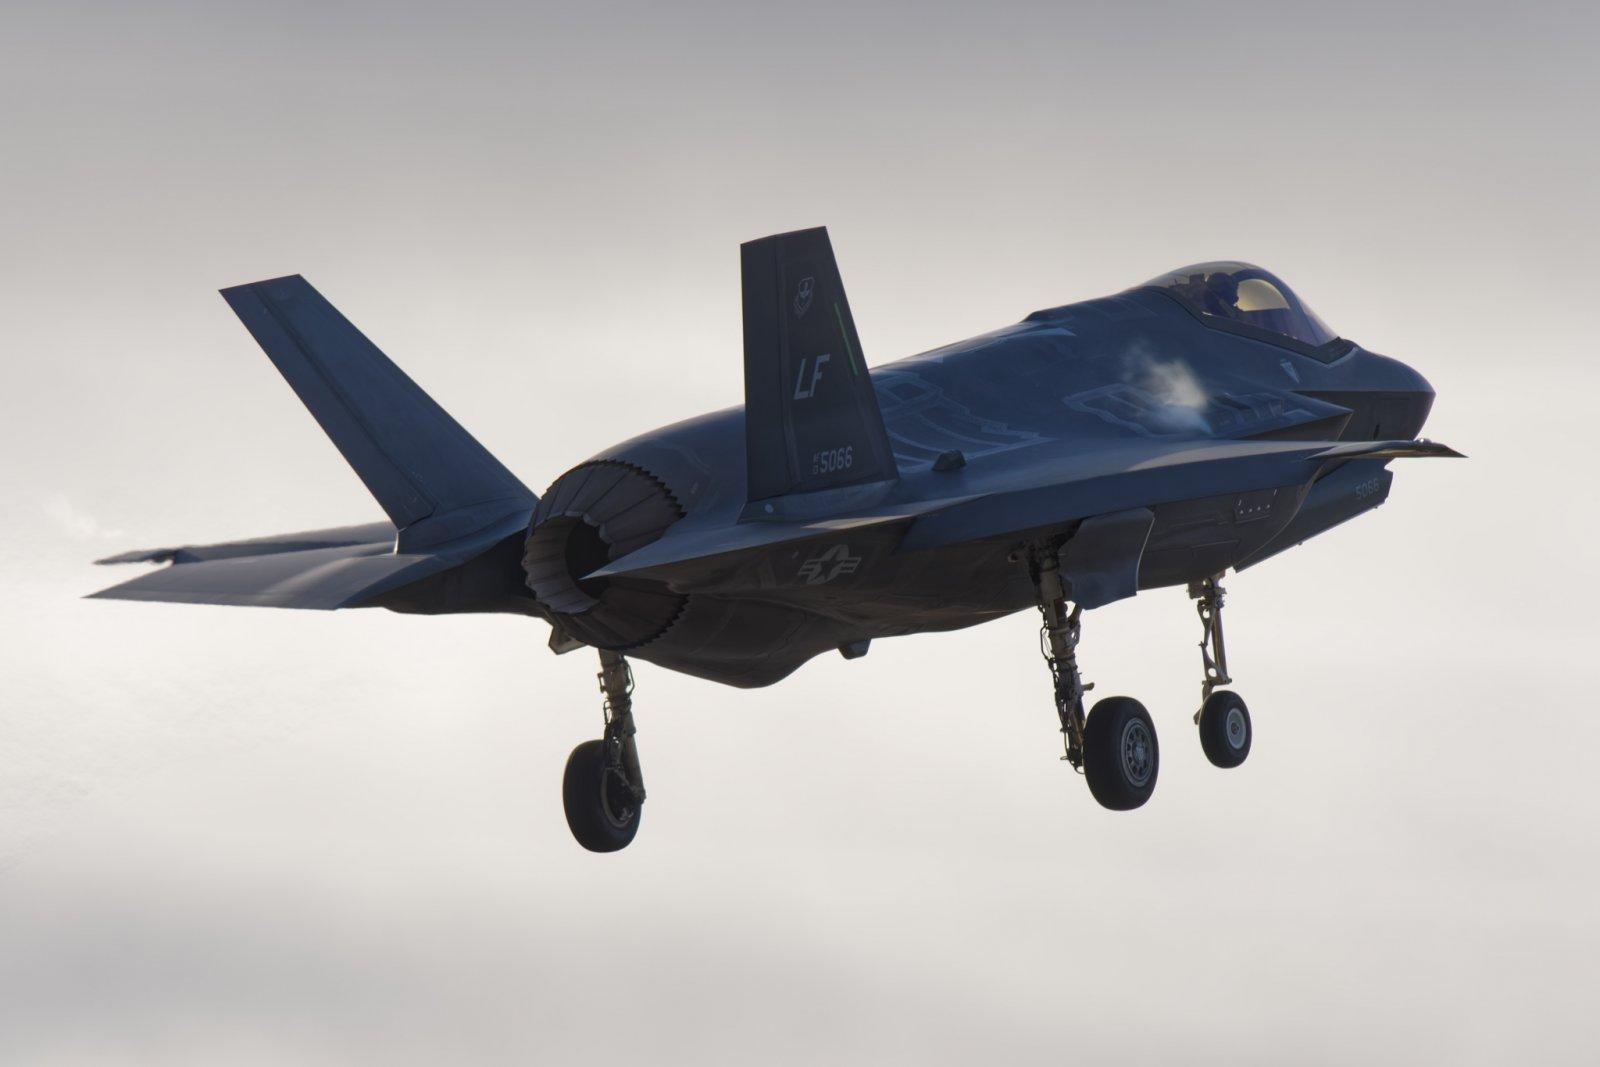 Lockheed Martin F-35A Lightning II 15-5189 esiintyy maltillisemmin